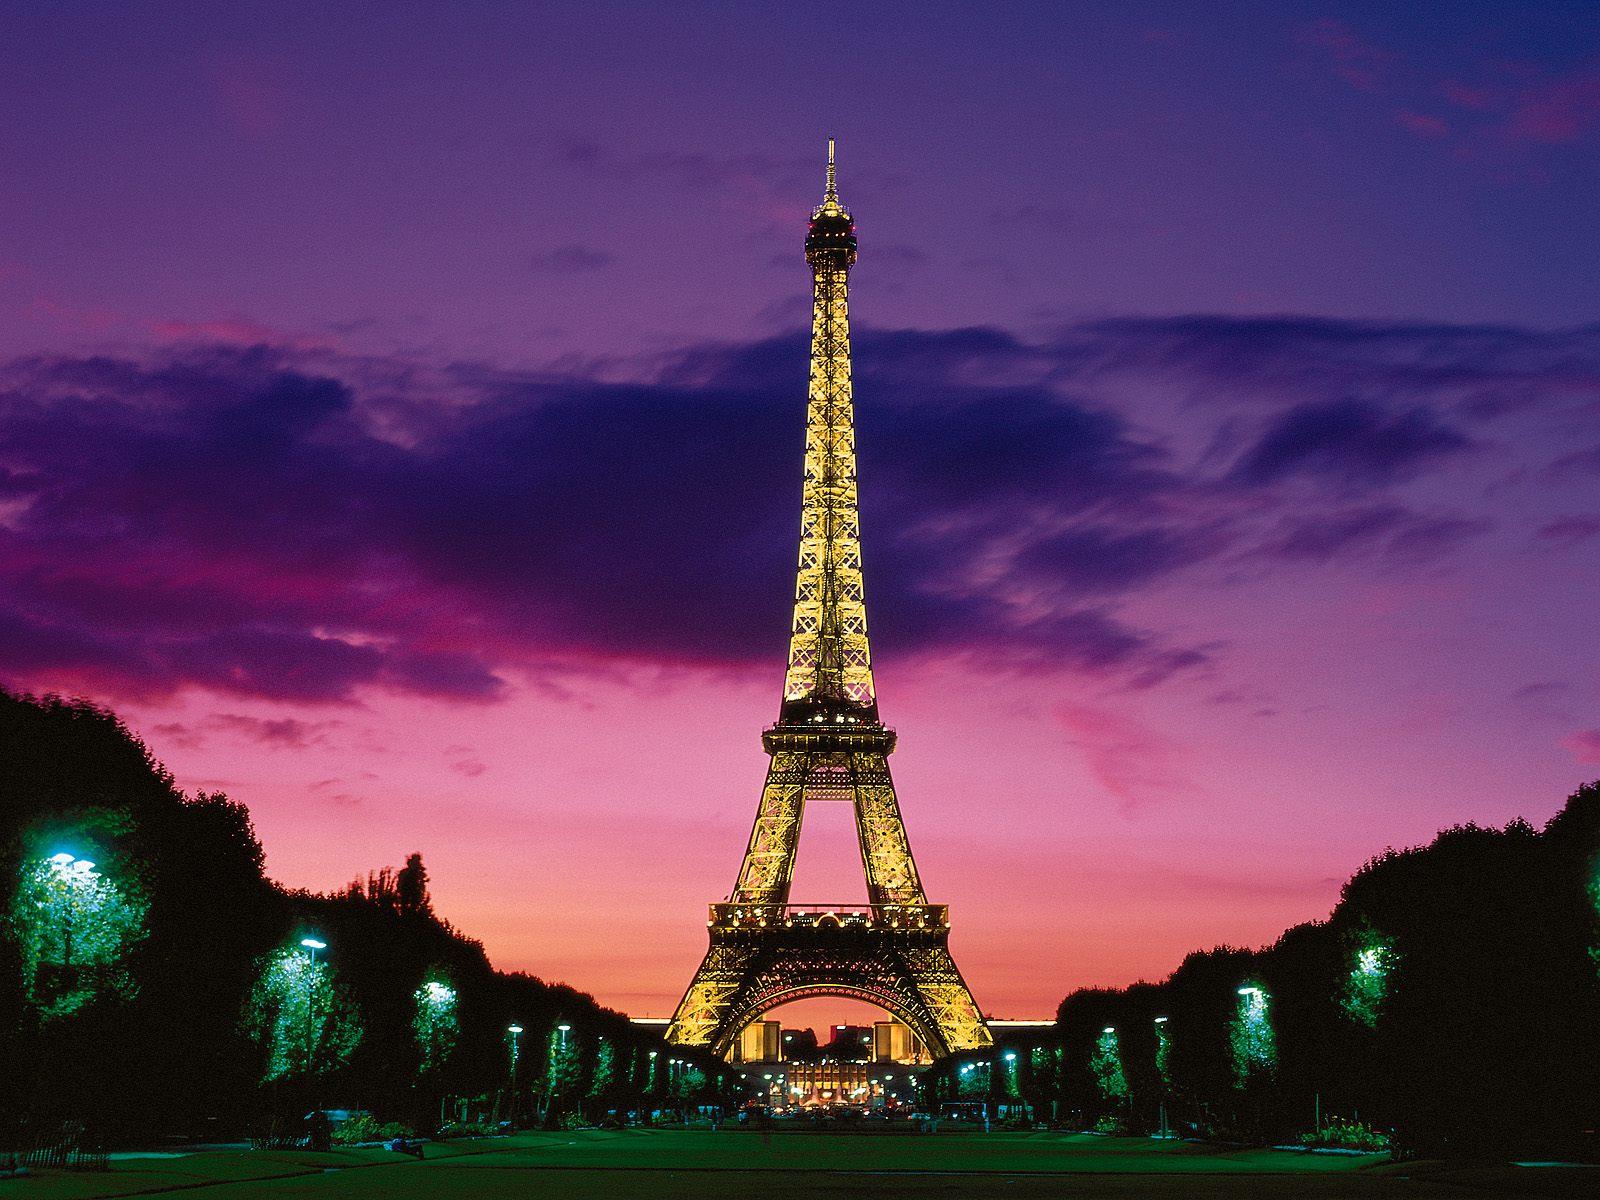 Eiffel tower hd wallpapers beautiful eiffel tower night for Paris orange card